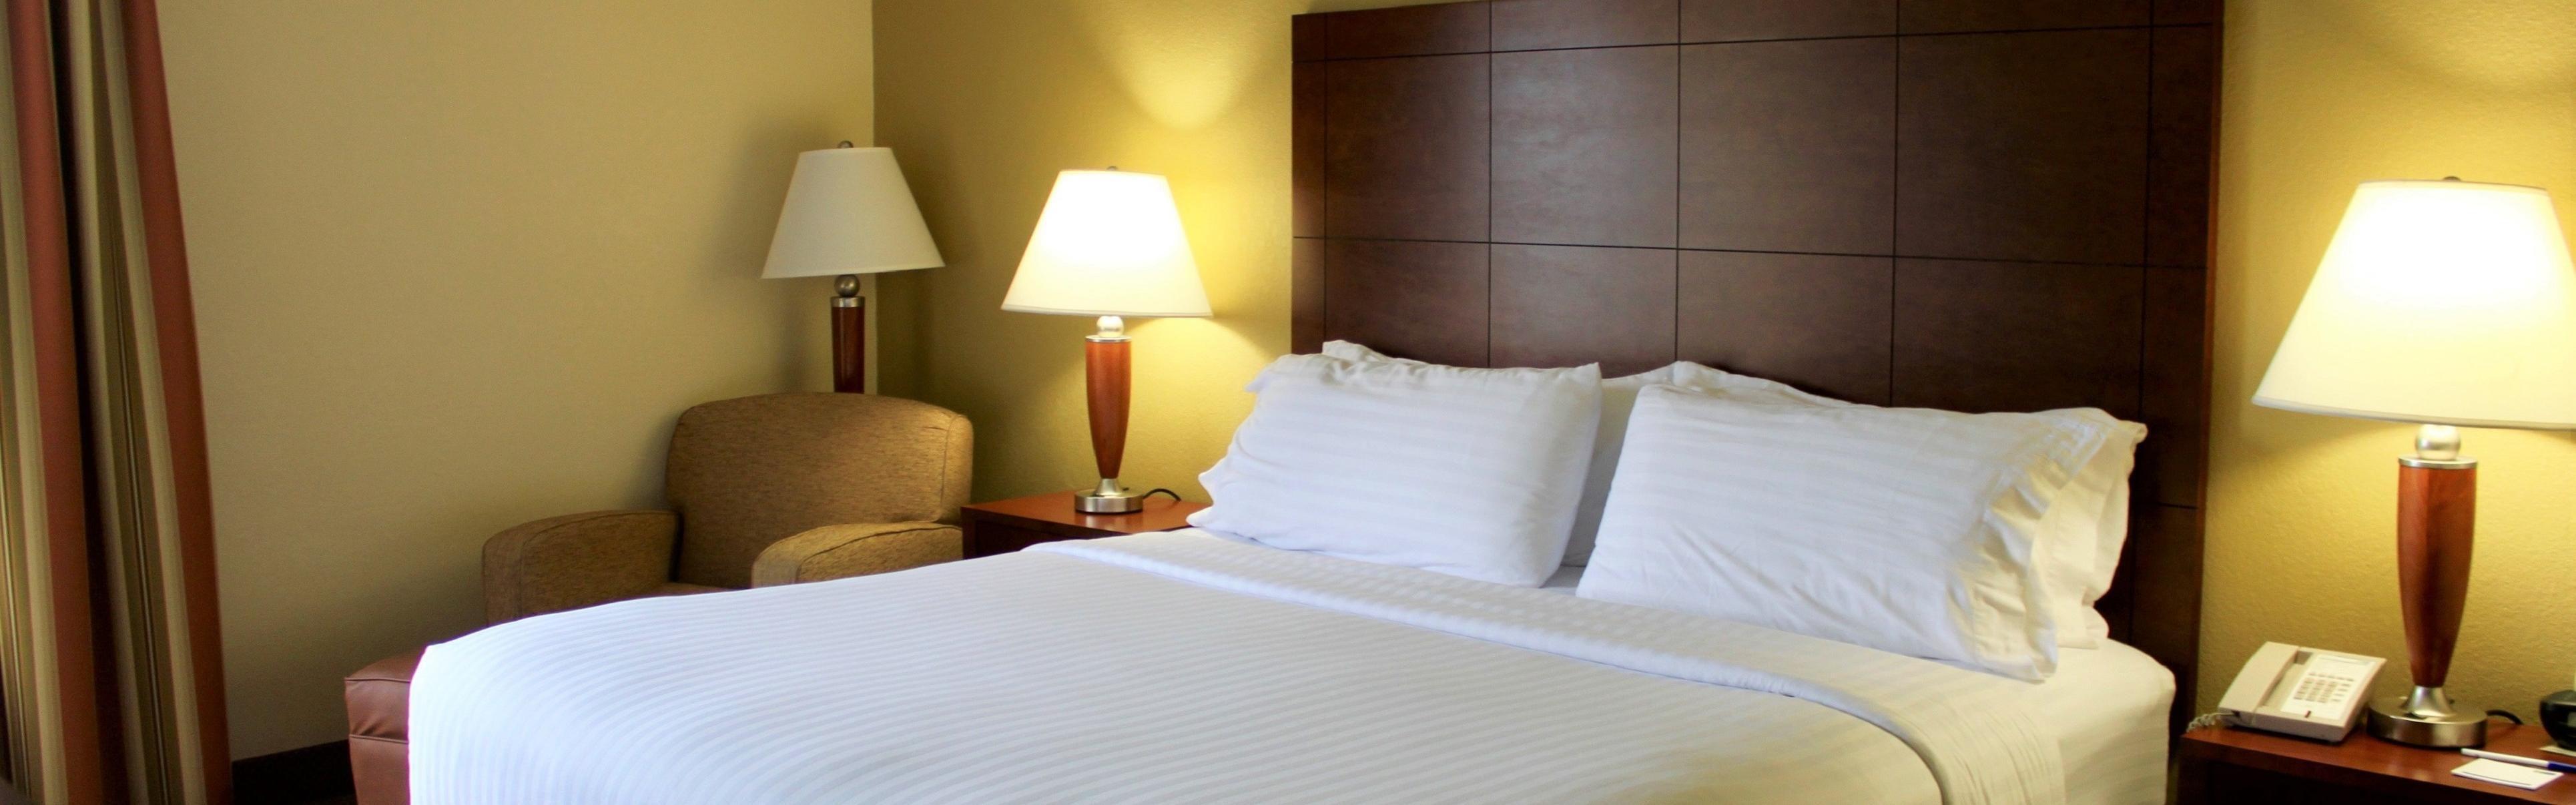 Holiday Inn Express Middlesboro image 1